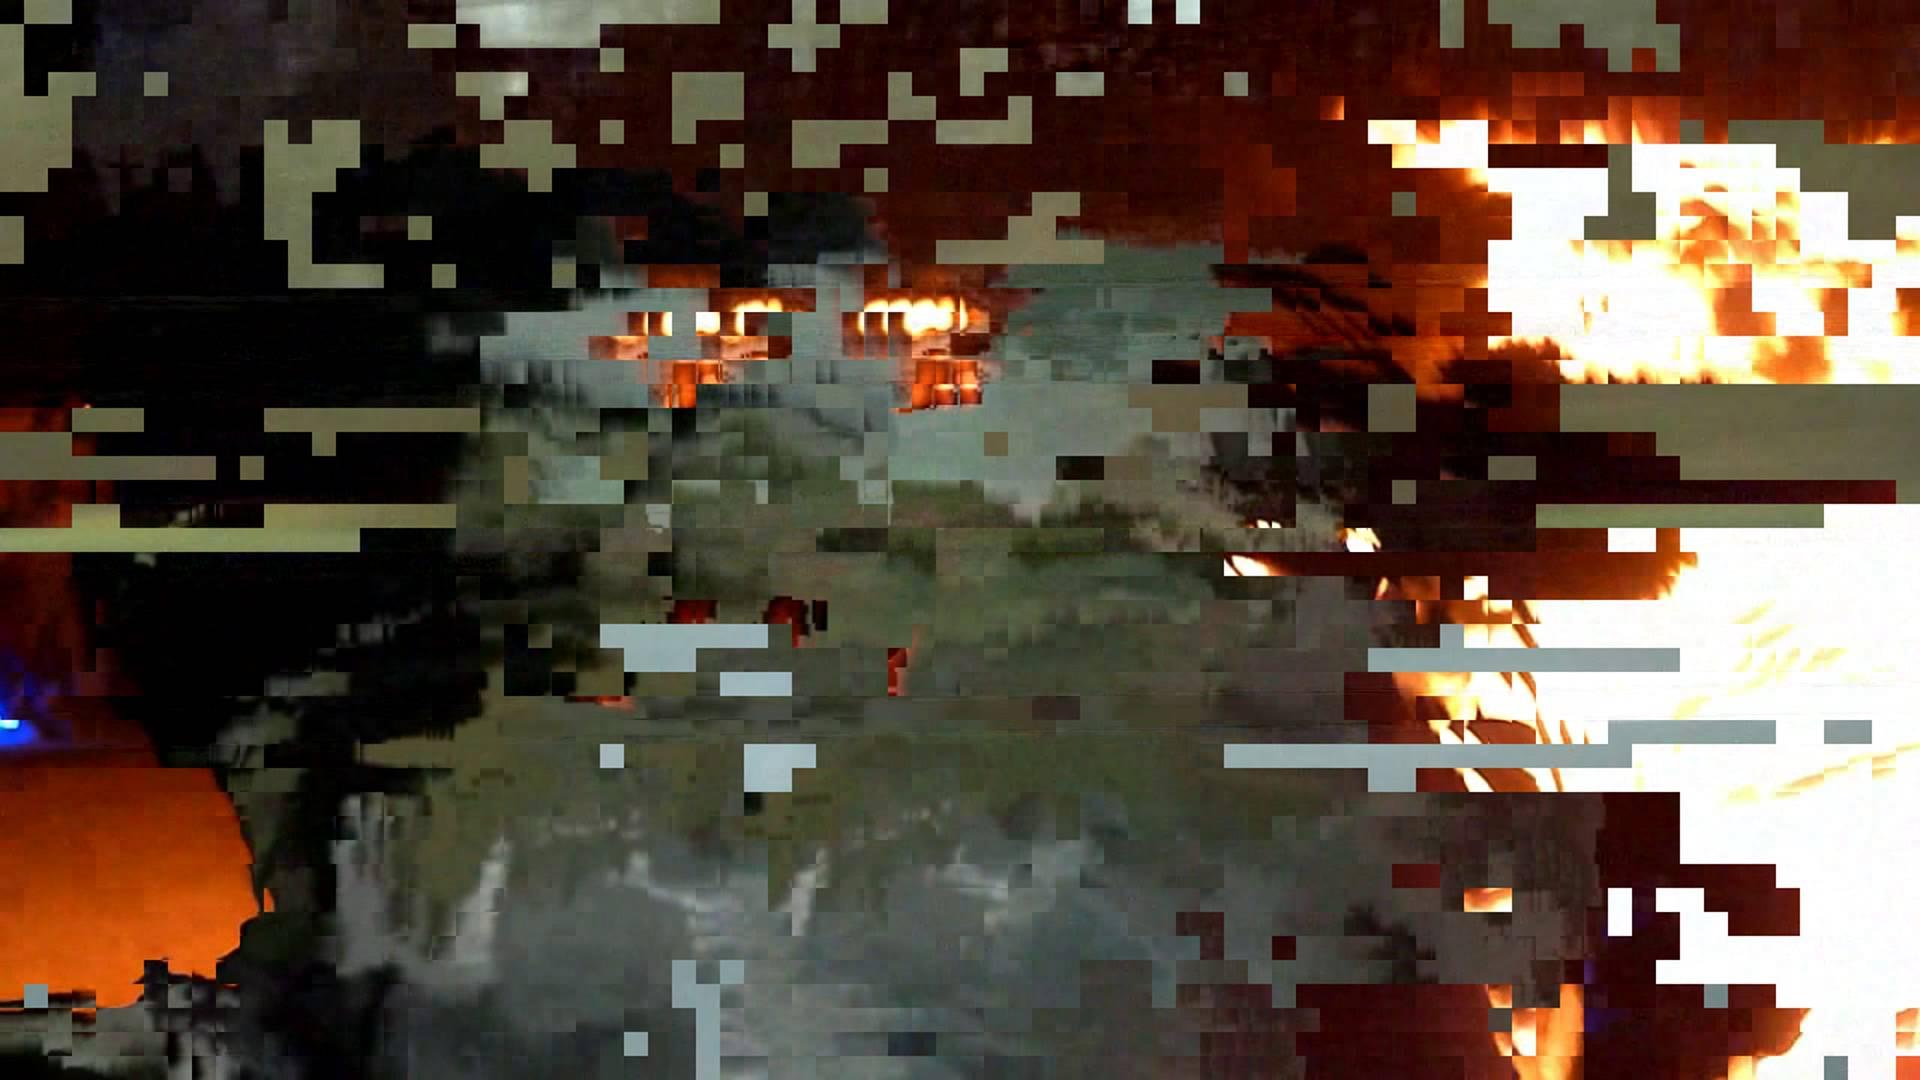 datamoshed carcrash and fire glitch video